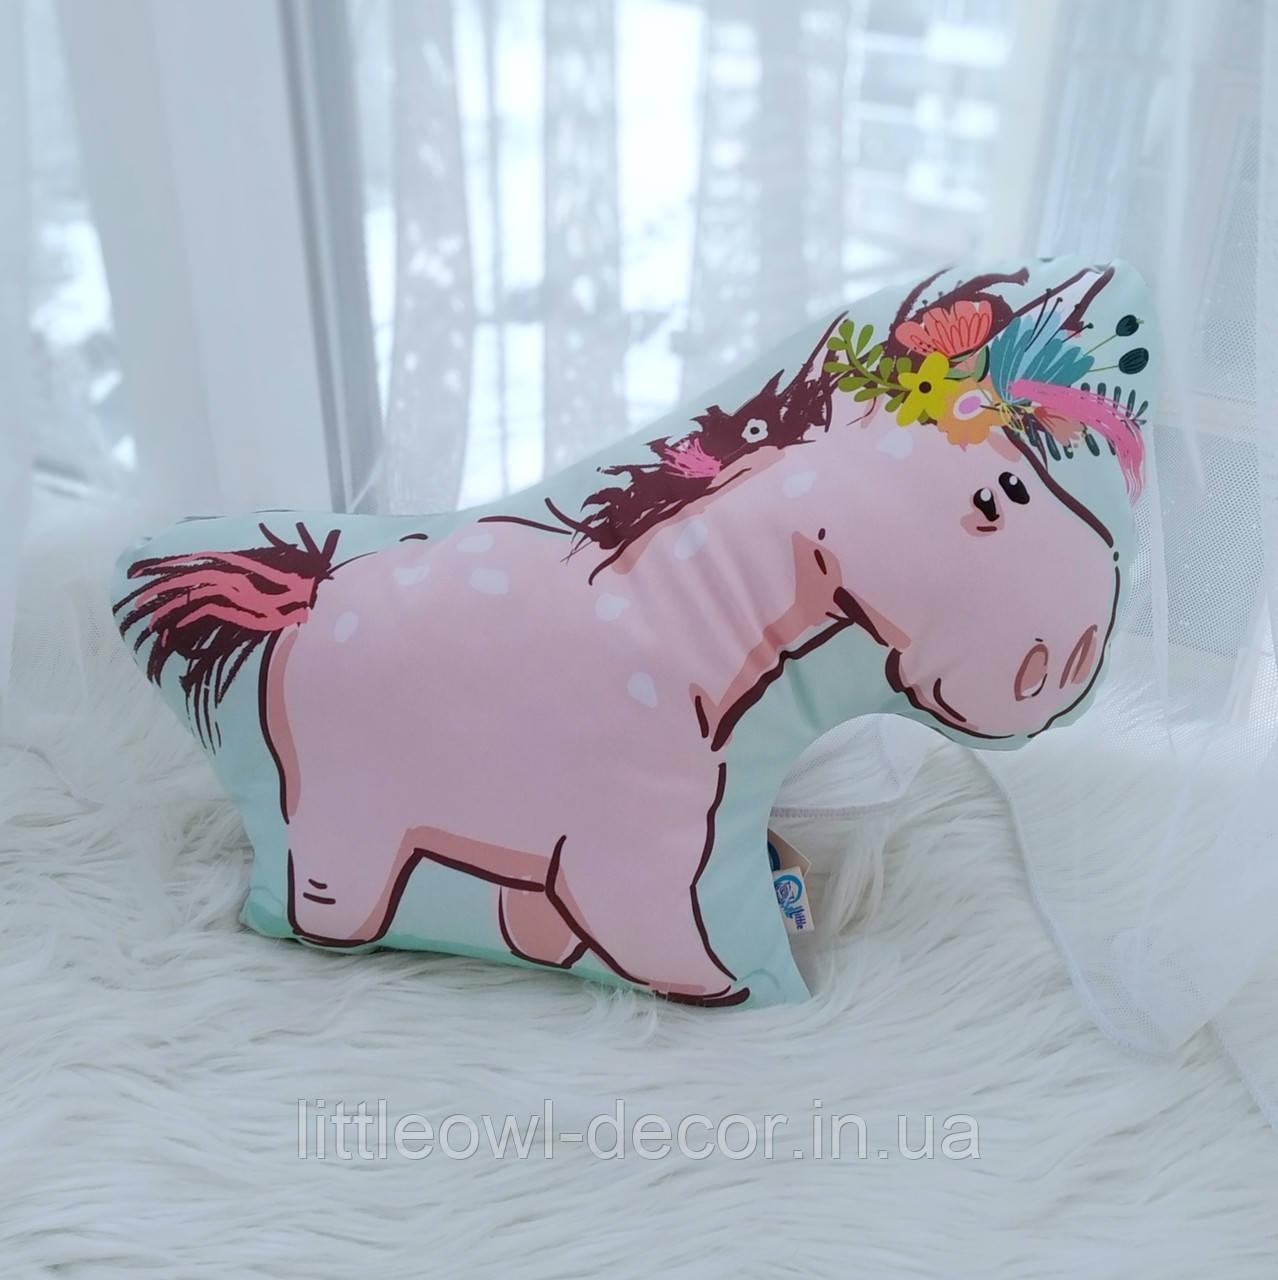 Подушка пони- Единорожек 45см